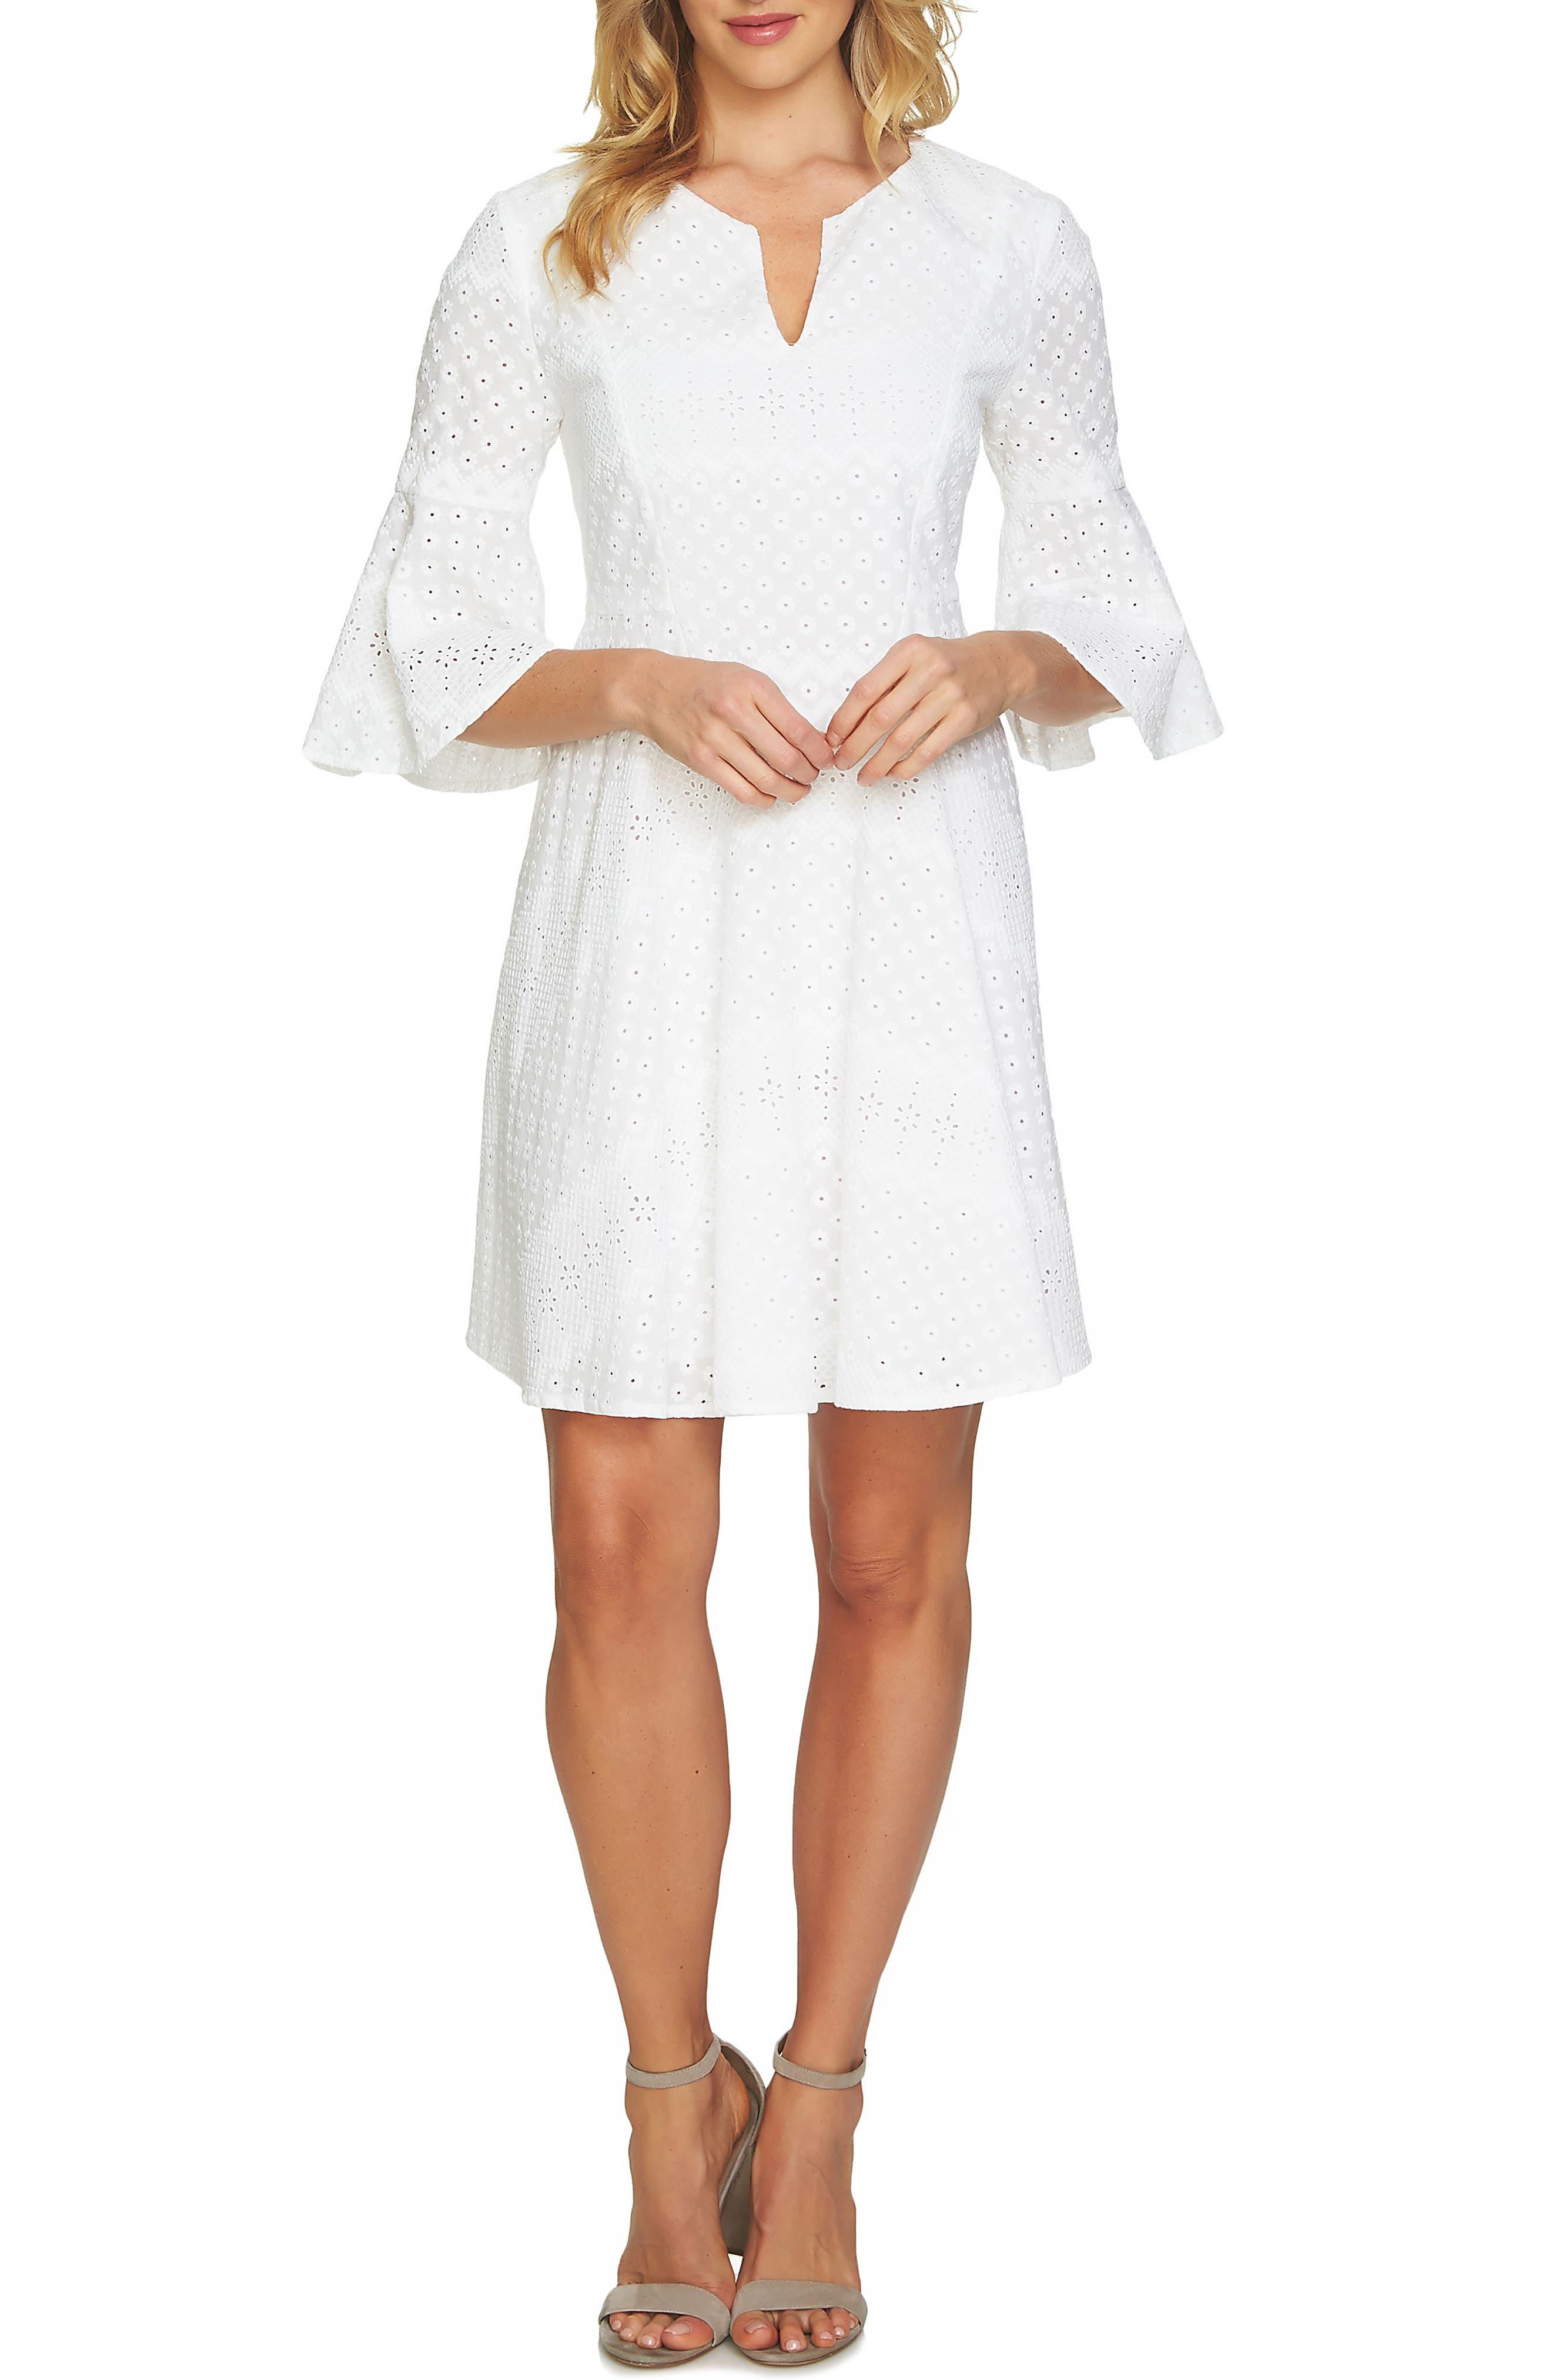 Bell Sleeve Eyelet A-Line Dress,                             Main thumbnail 1, color,                             160